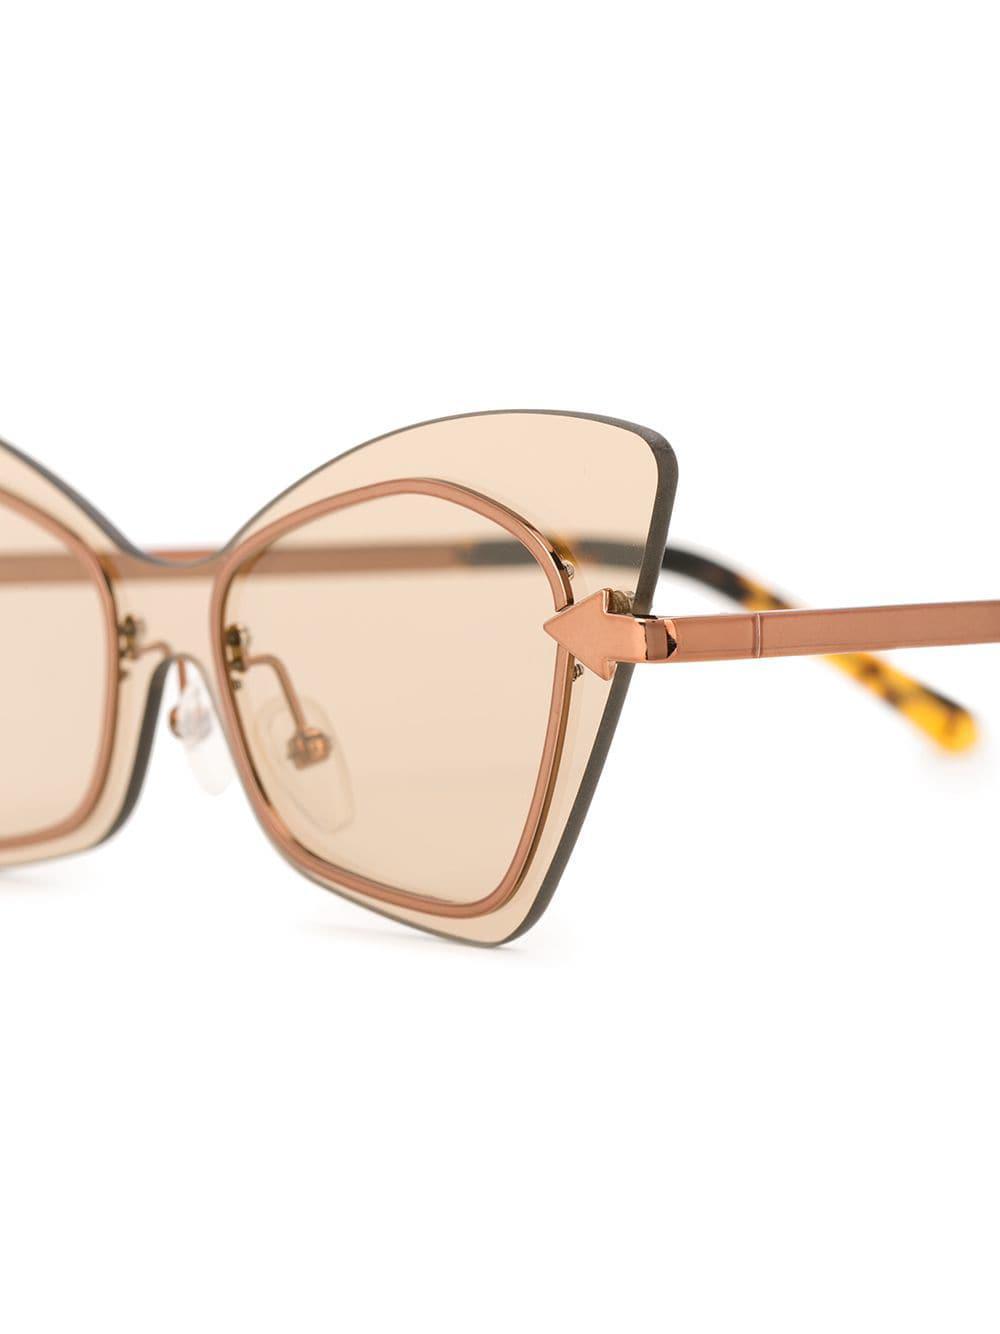 b38d8c7527 Lyst - Karen Walker Mrs Brill Crazy Tort Sunglasses in Brown